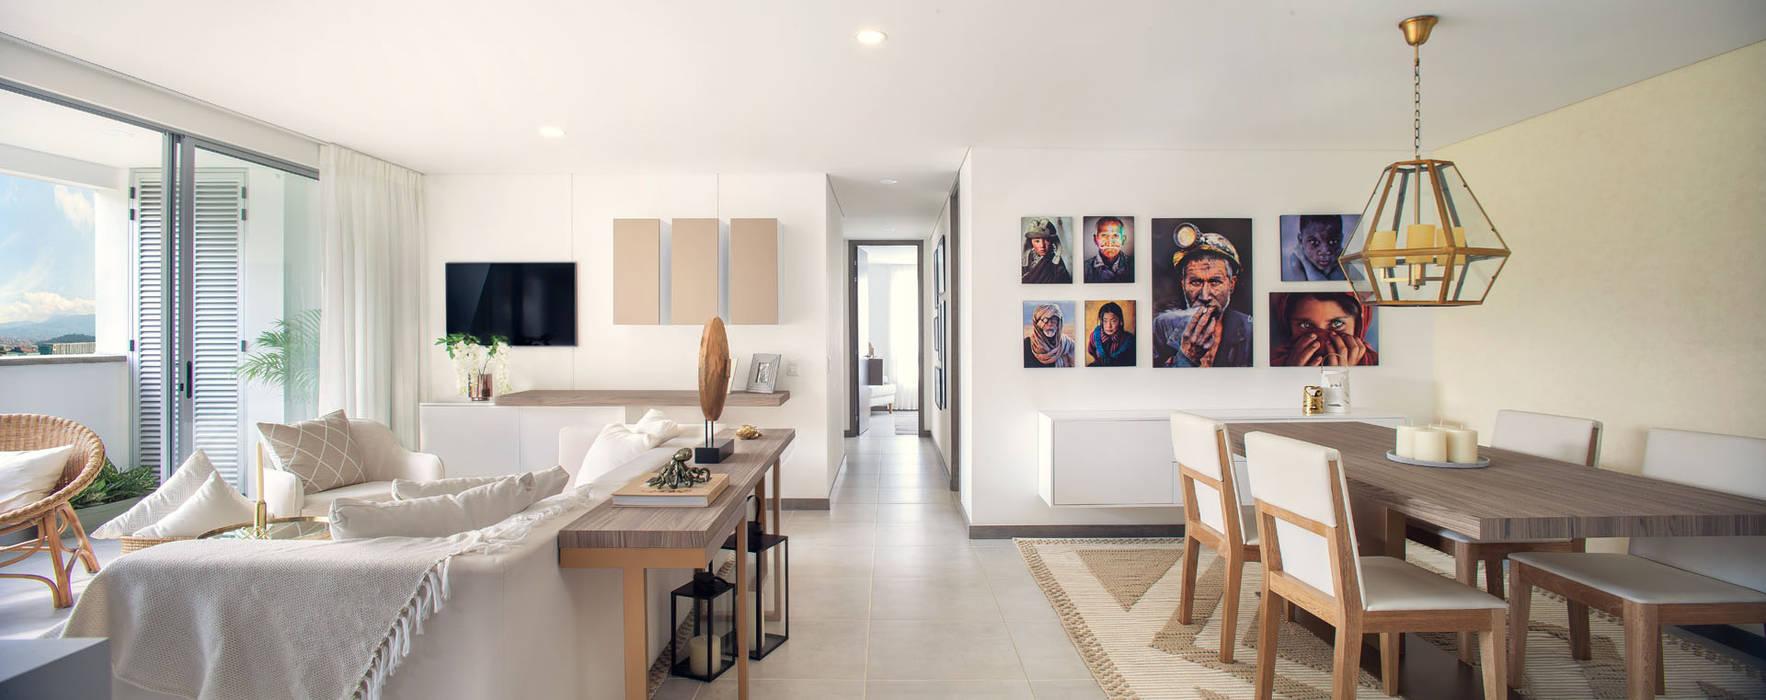 corredor: Salas de estilo  por Maria Mentira Studio